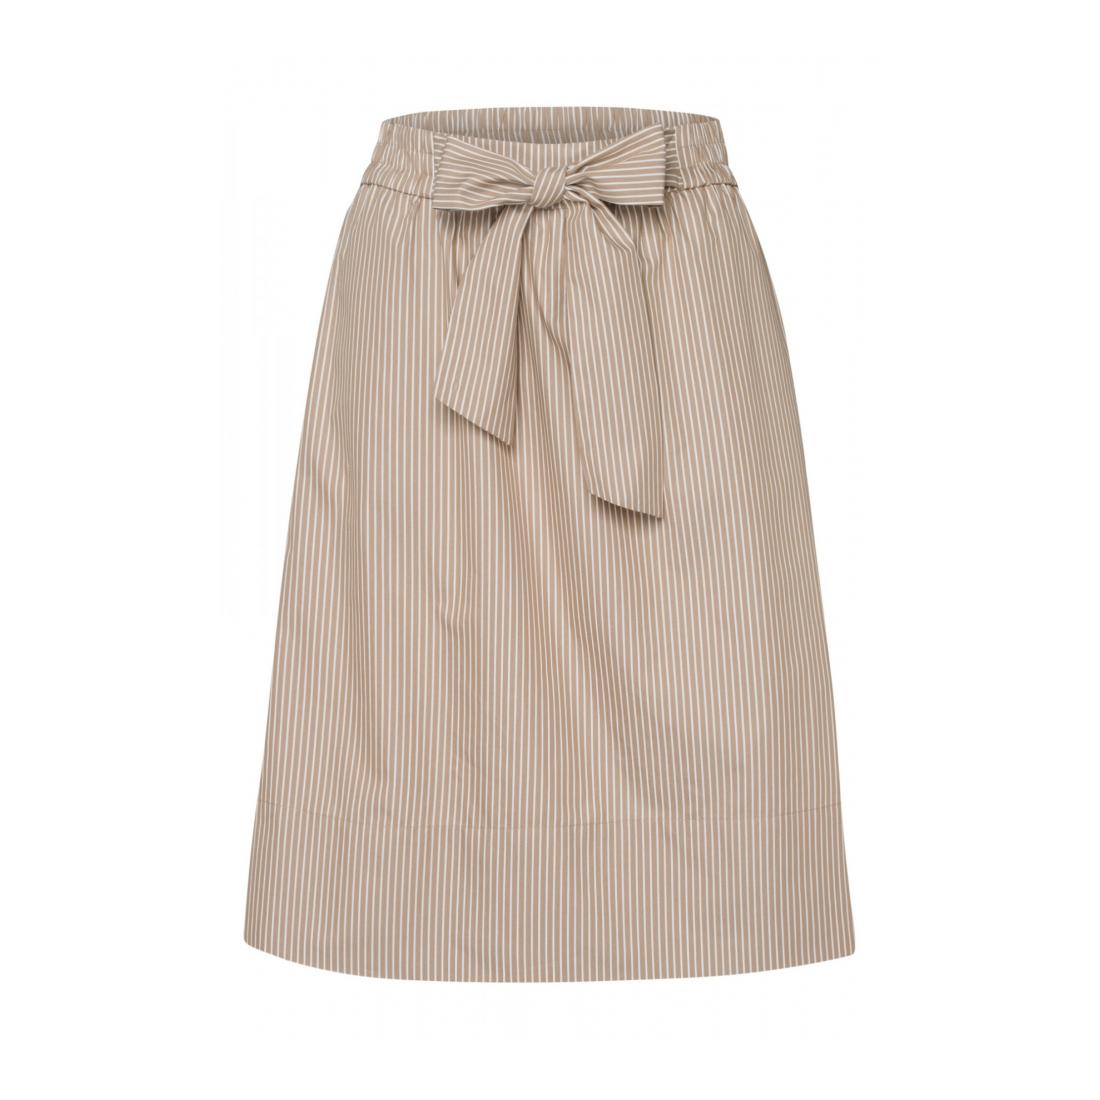 More & More Röcke normal Damen Fine Striped Poplin Skirt